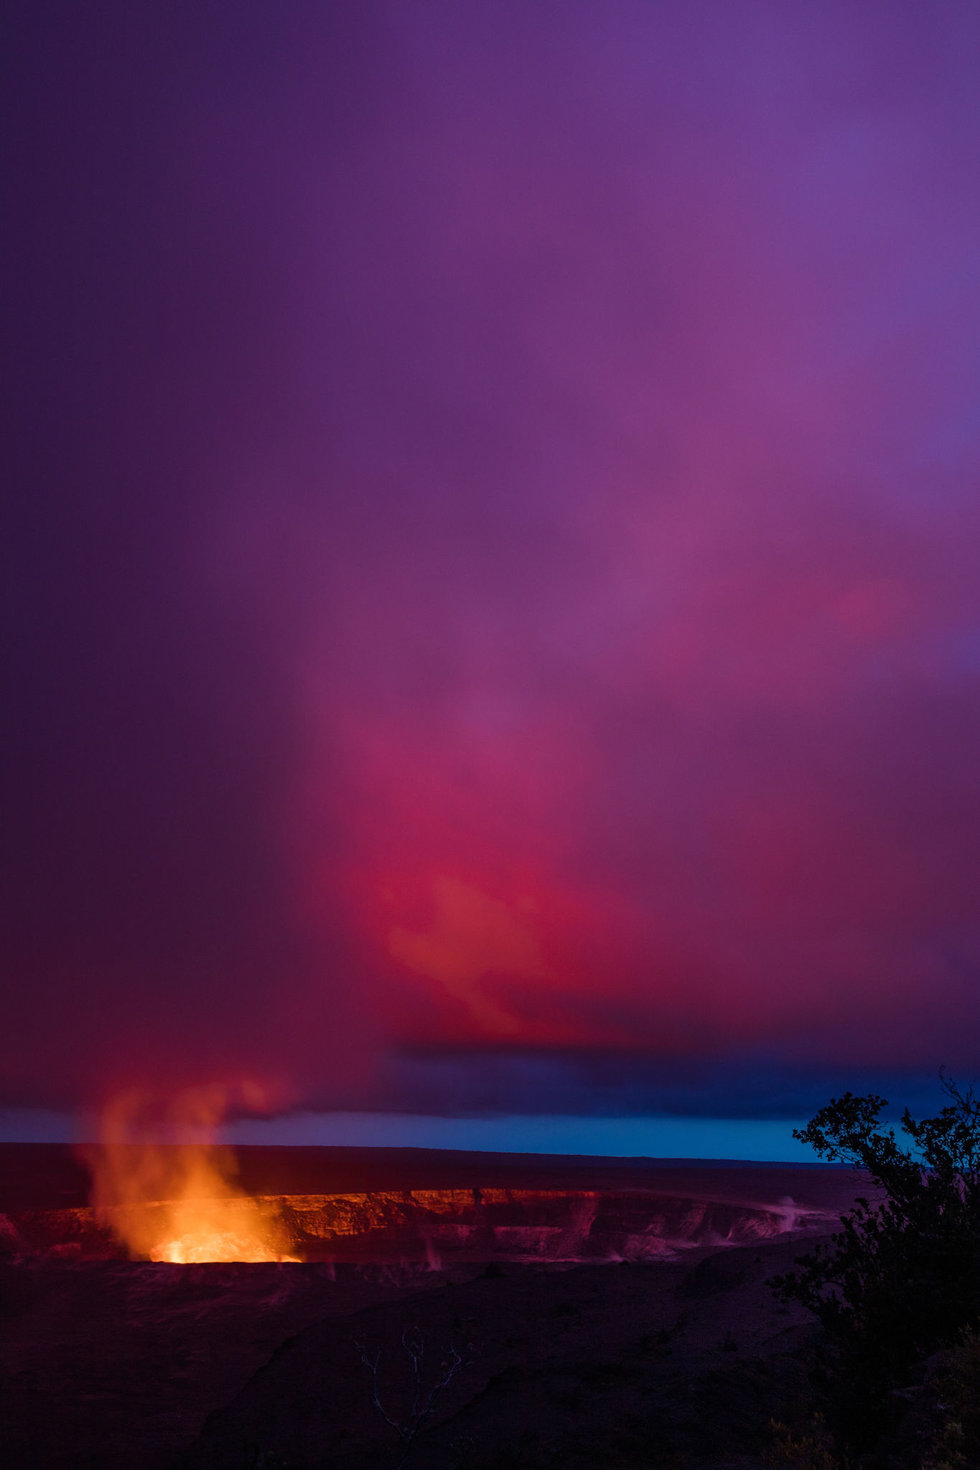 A lava lake at Halema'uma'u Crater in Hawaii Volcanoes National Park